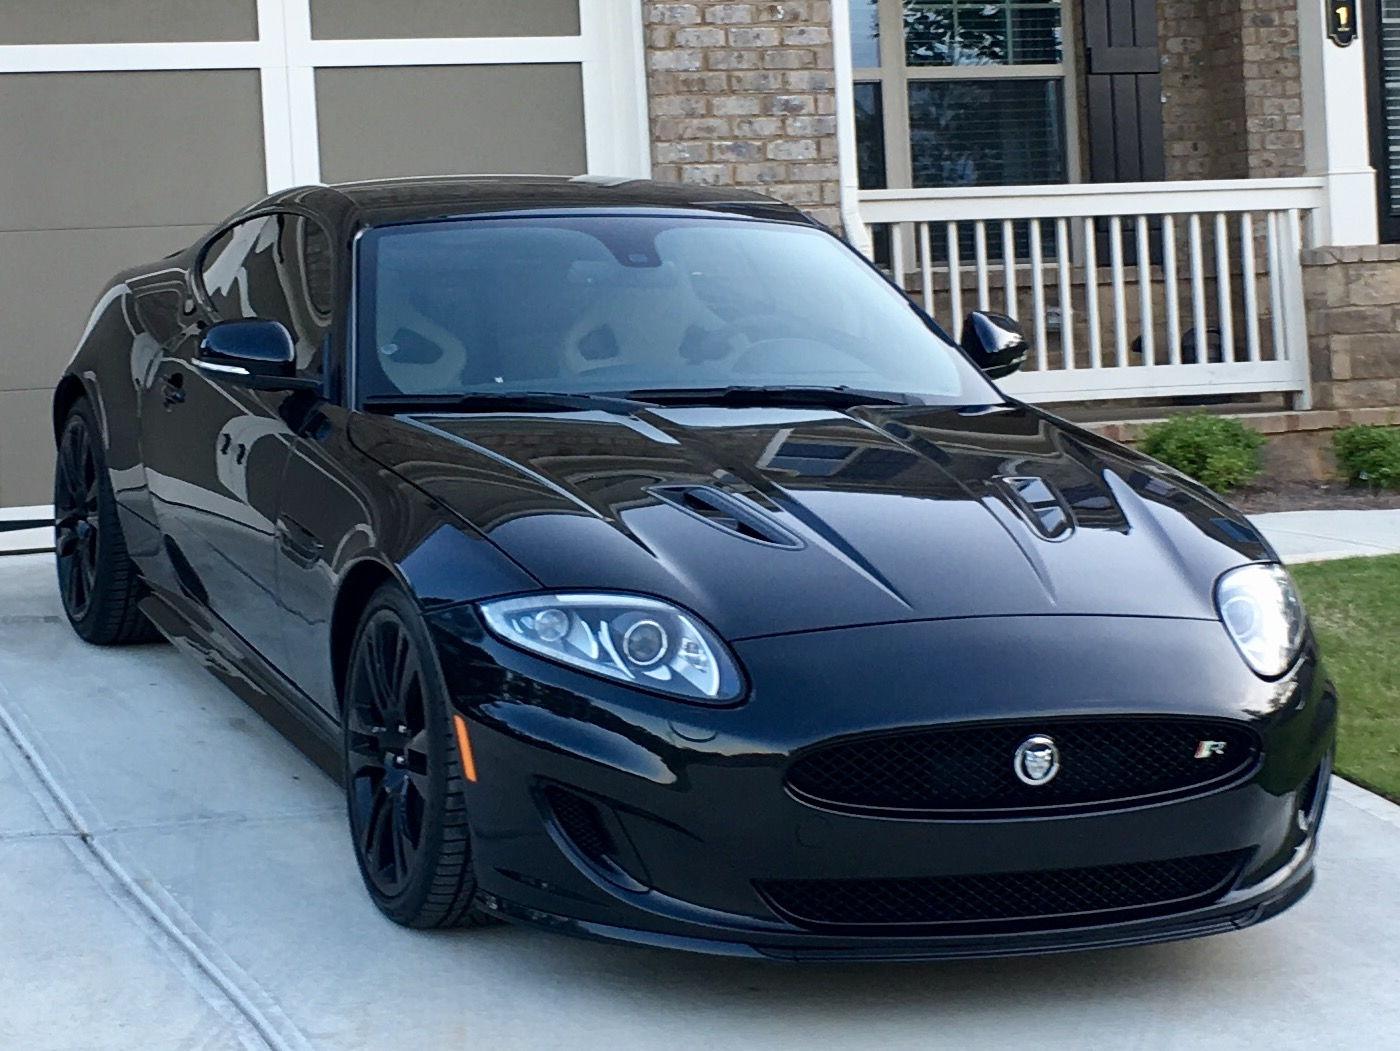 atlanta hennessy source csr and jaguar ga luxury xj new